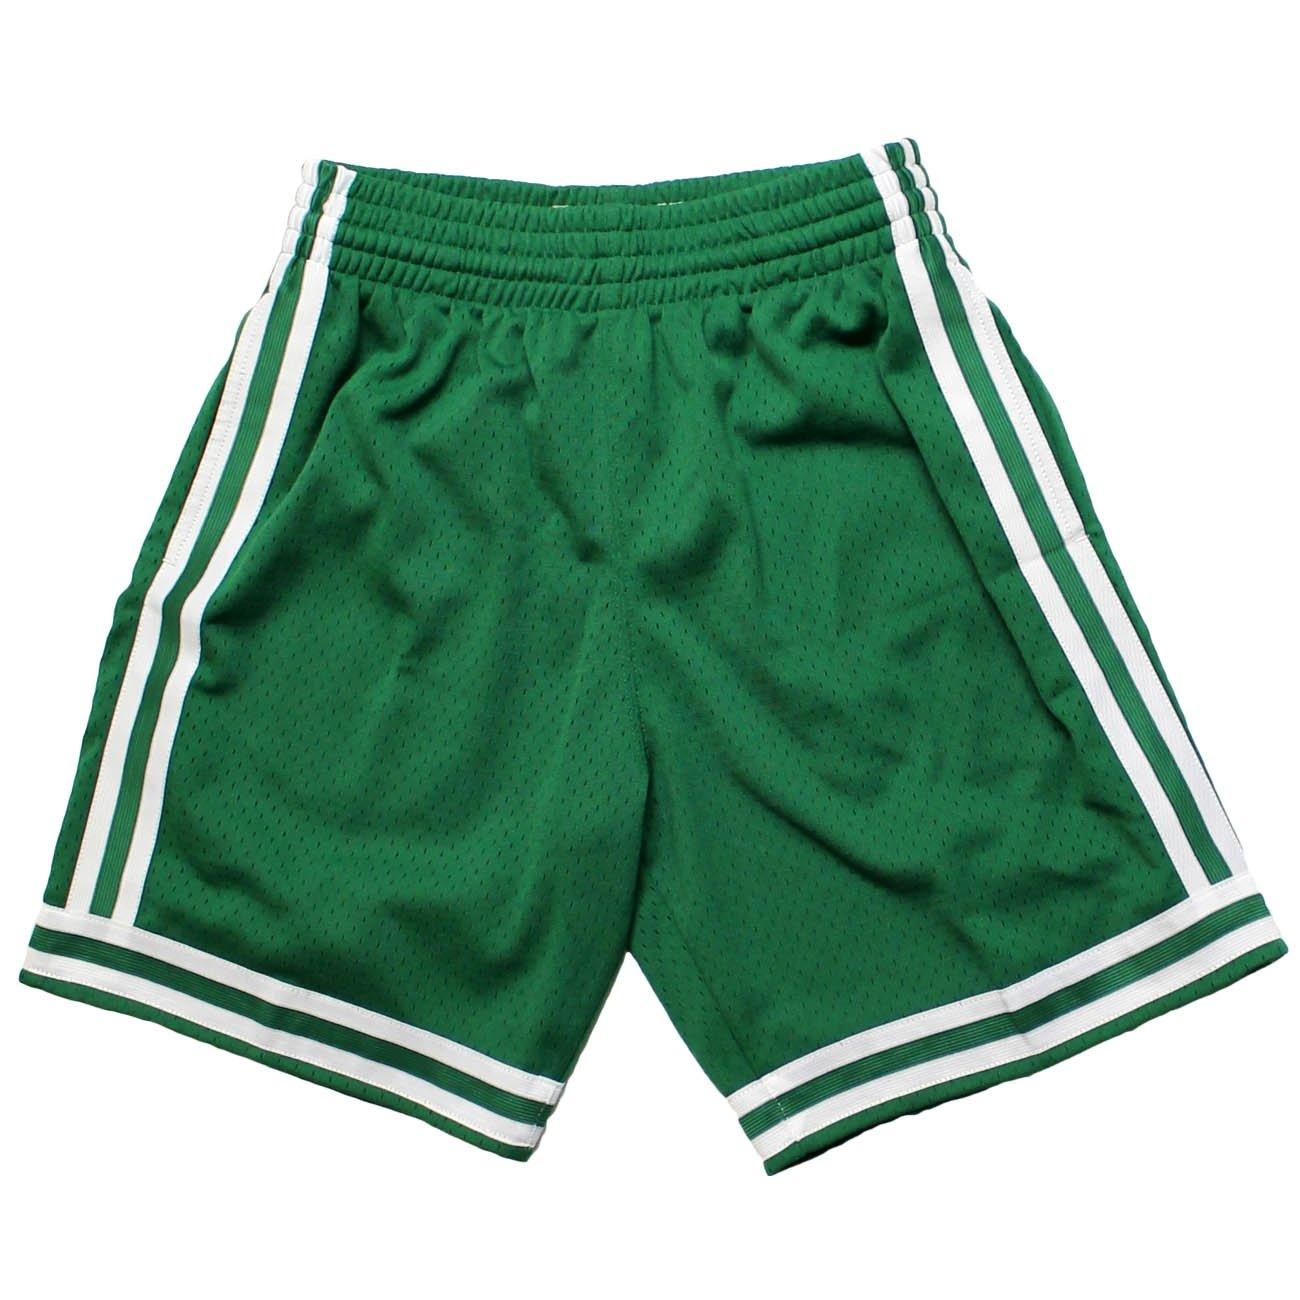 Mitchell & Ness Boston Celtics 1985-1986 Swingman NBA Shorts Grün